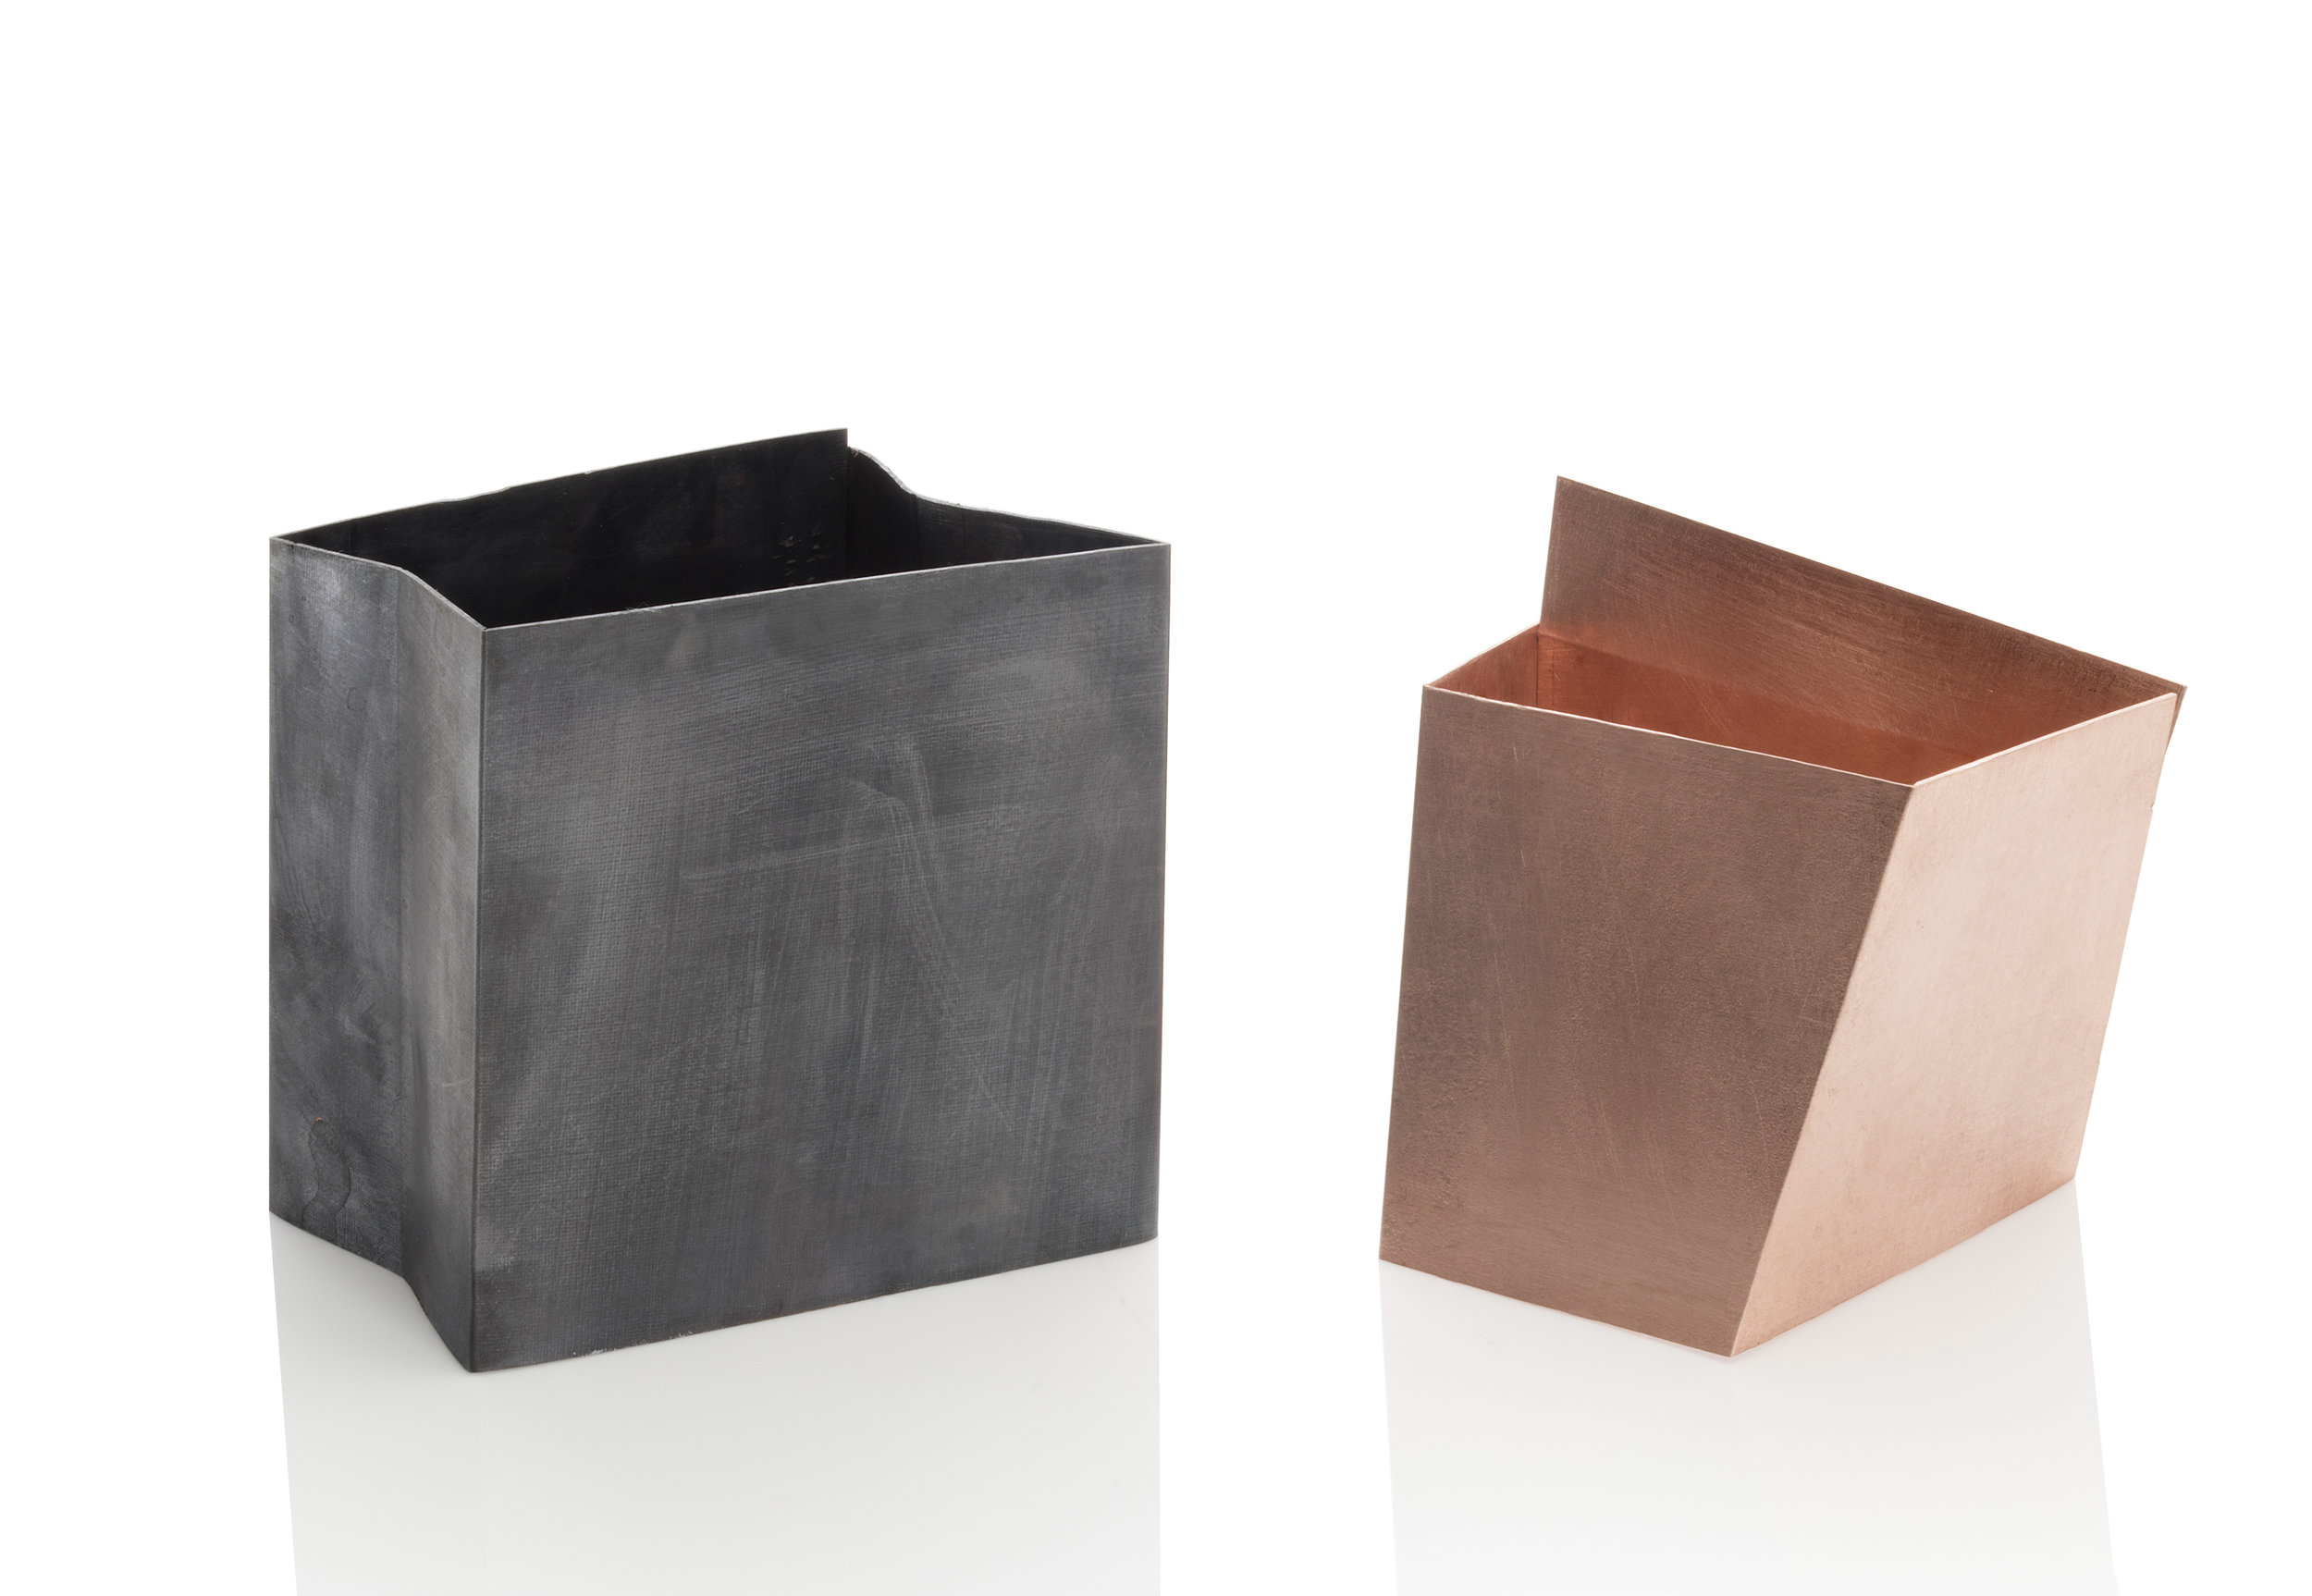 new 30-4-18 KeiT box .jpg